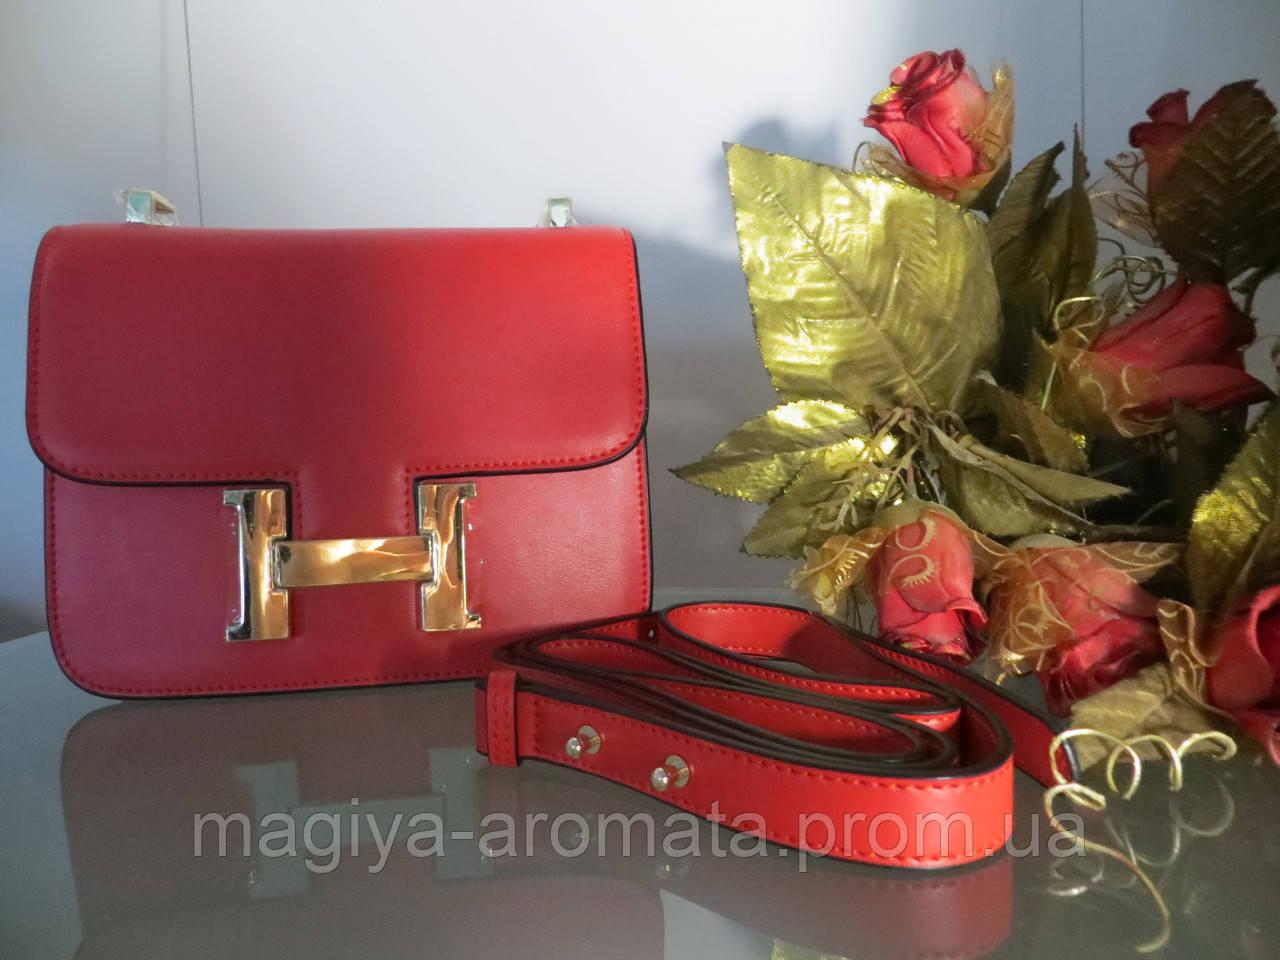 5bb24bba7d6a Женская сумка клатч от Hermes красный Original quality Сумка Hermes  Constance - Магия Аромата - Парфюмерия